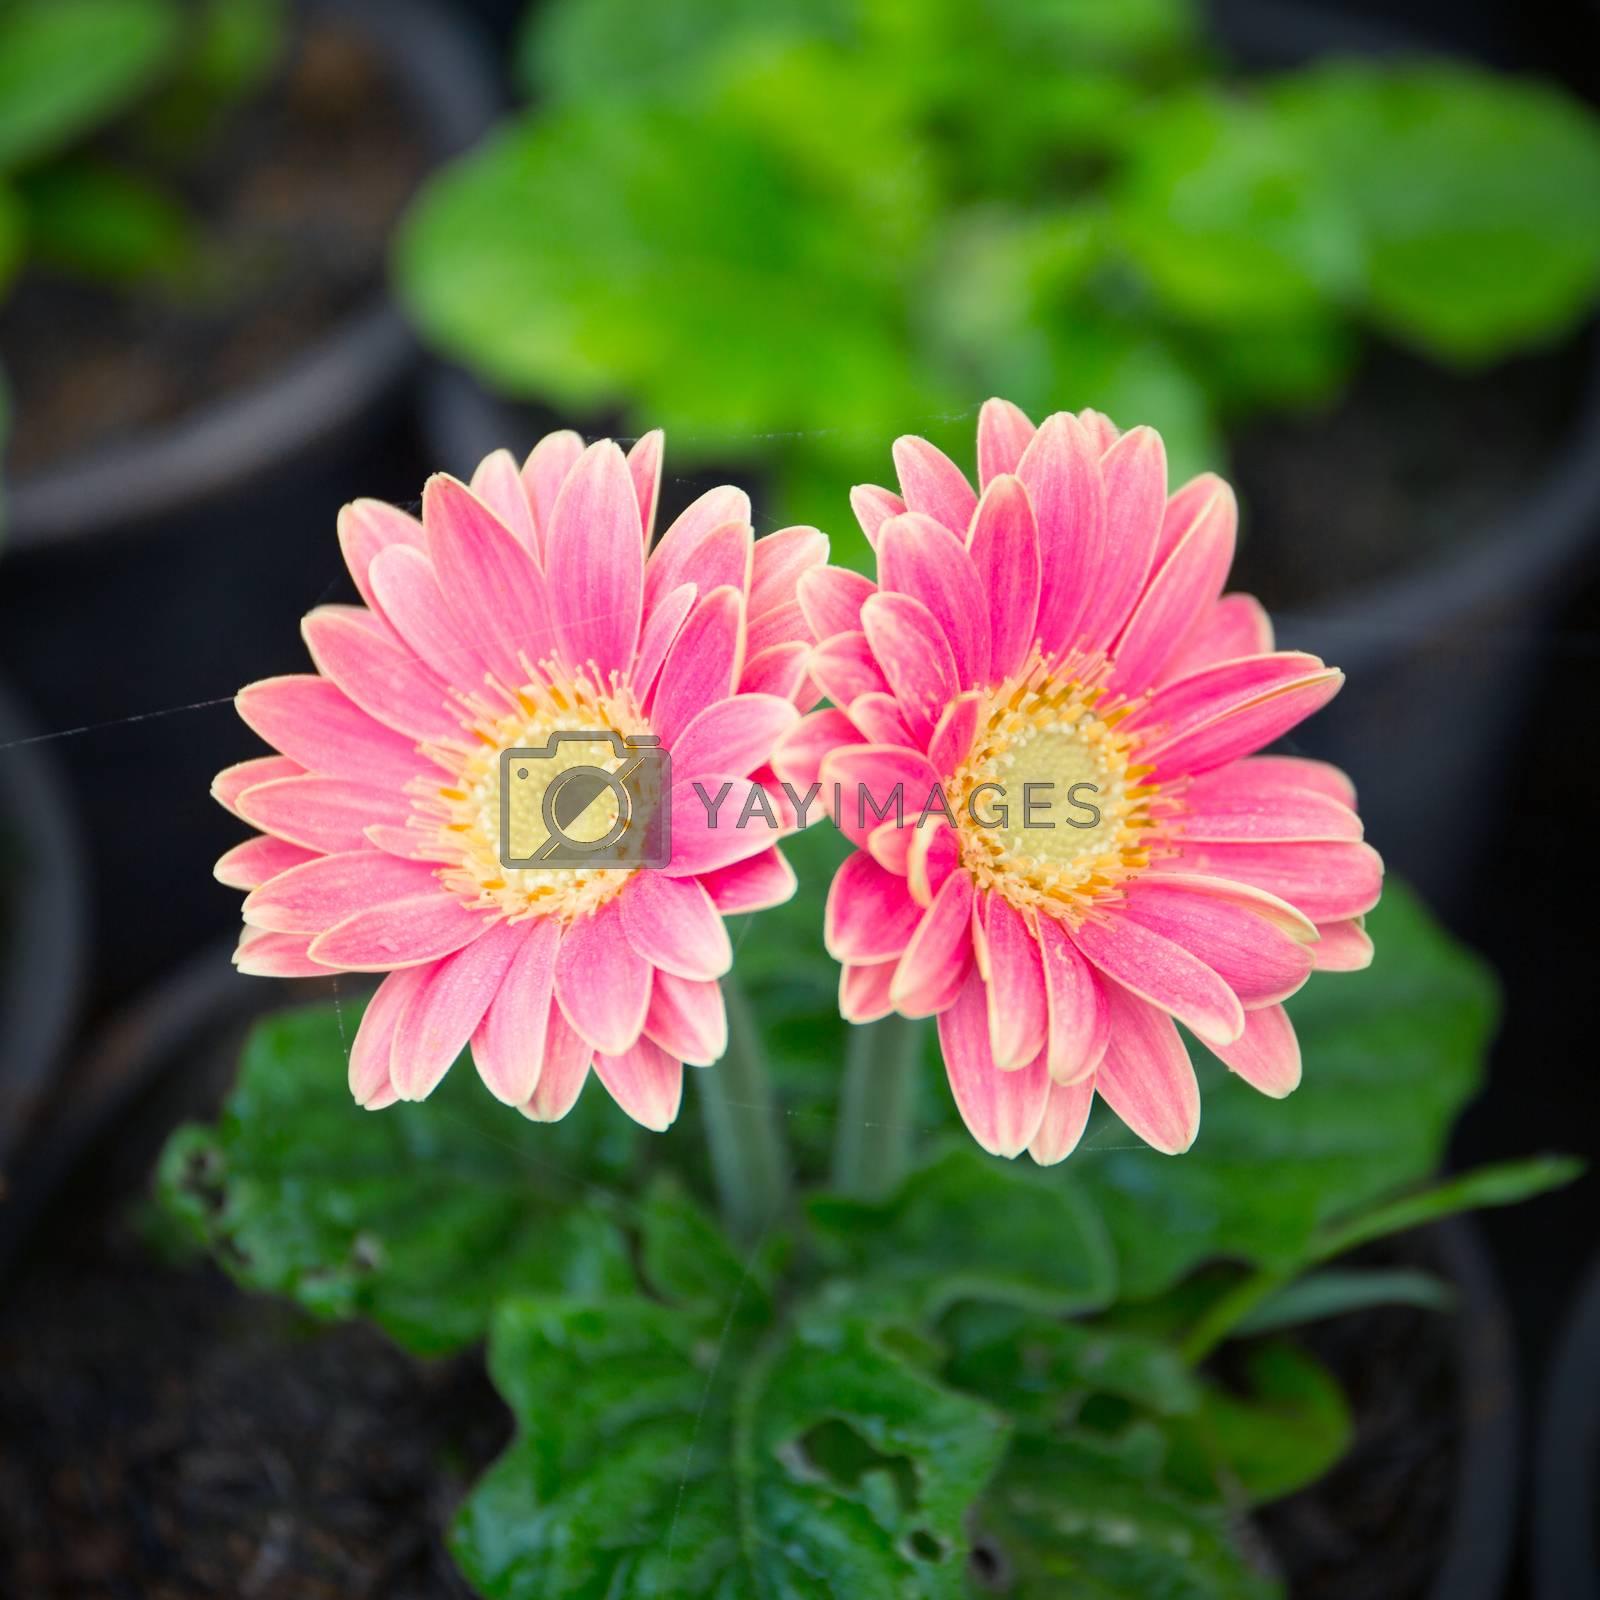 Royalty free image of Pink gerbera by tuchkay